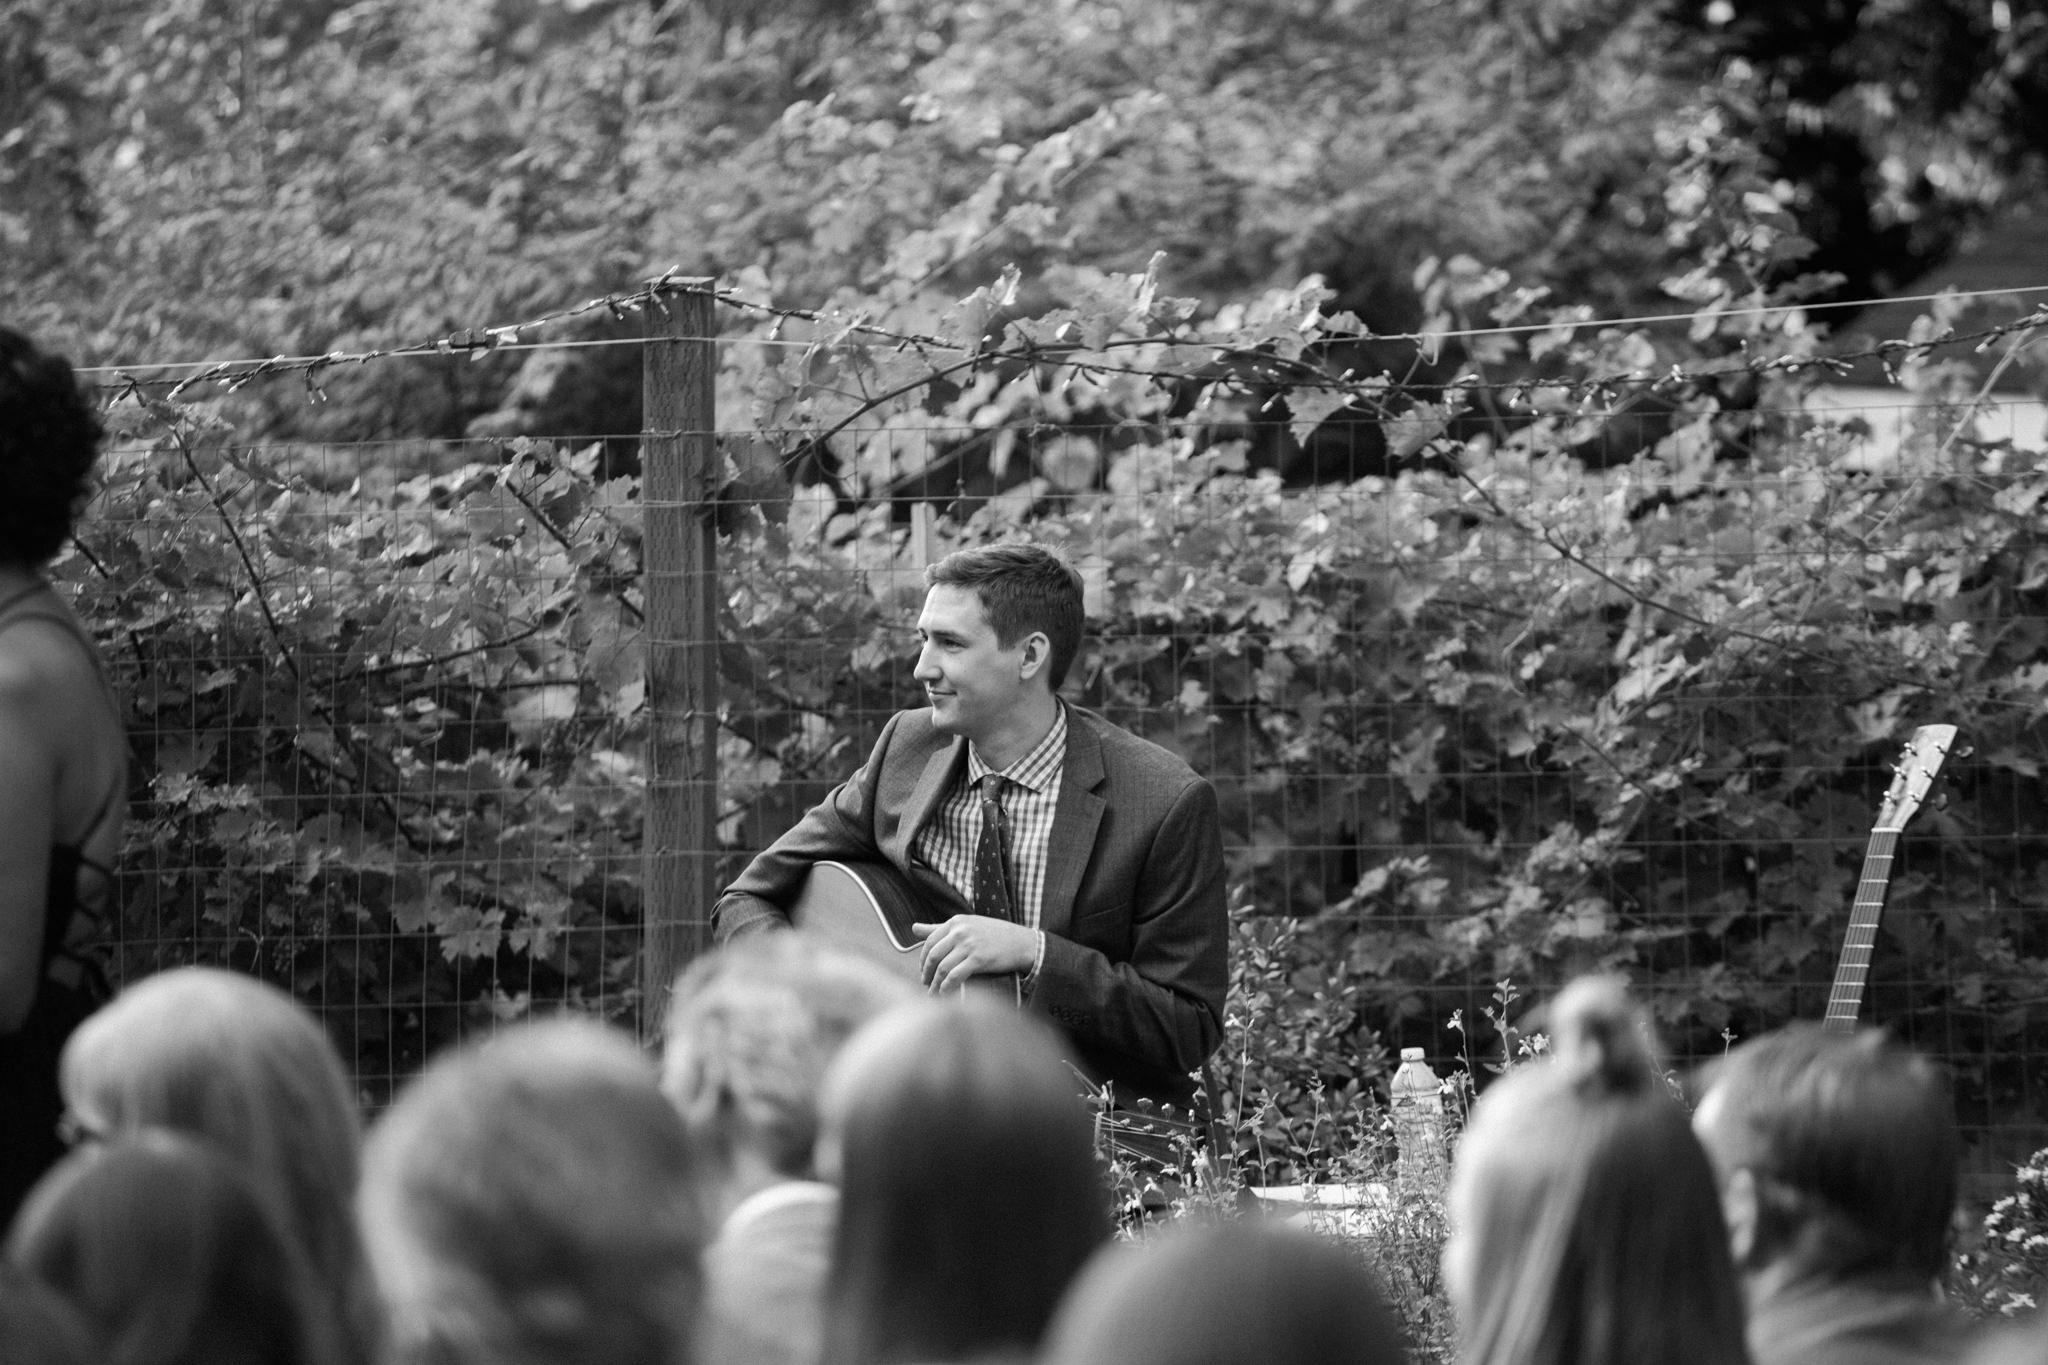 Backyard-Bainbridge-Island-Wedding-Alycia-Lovell-Photography-113.JPG